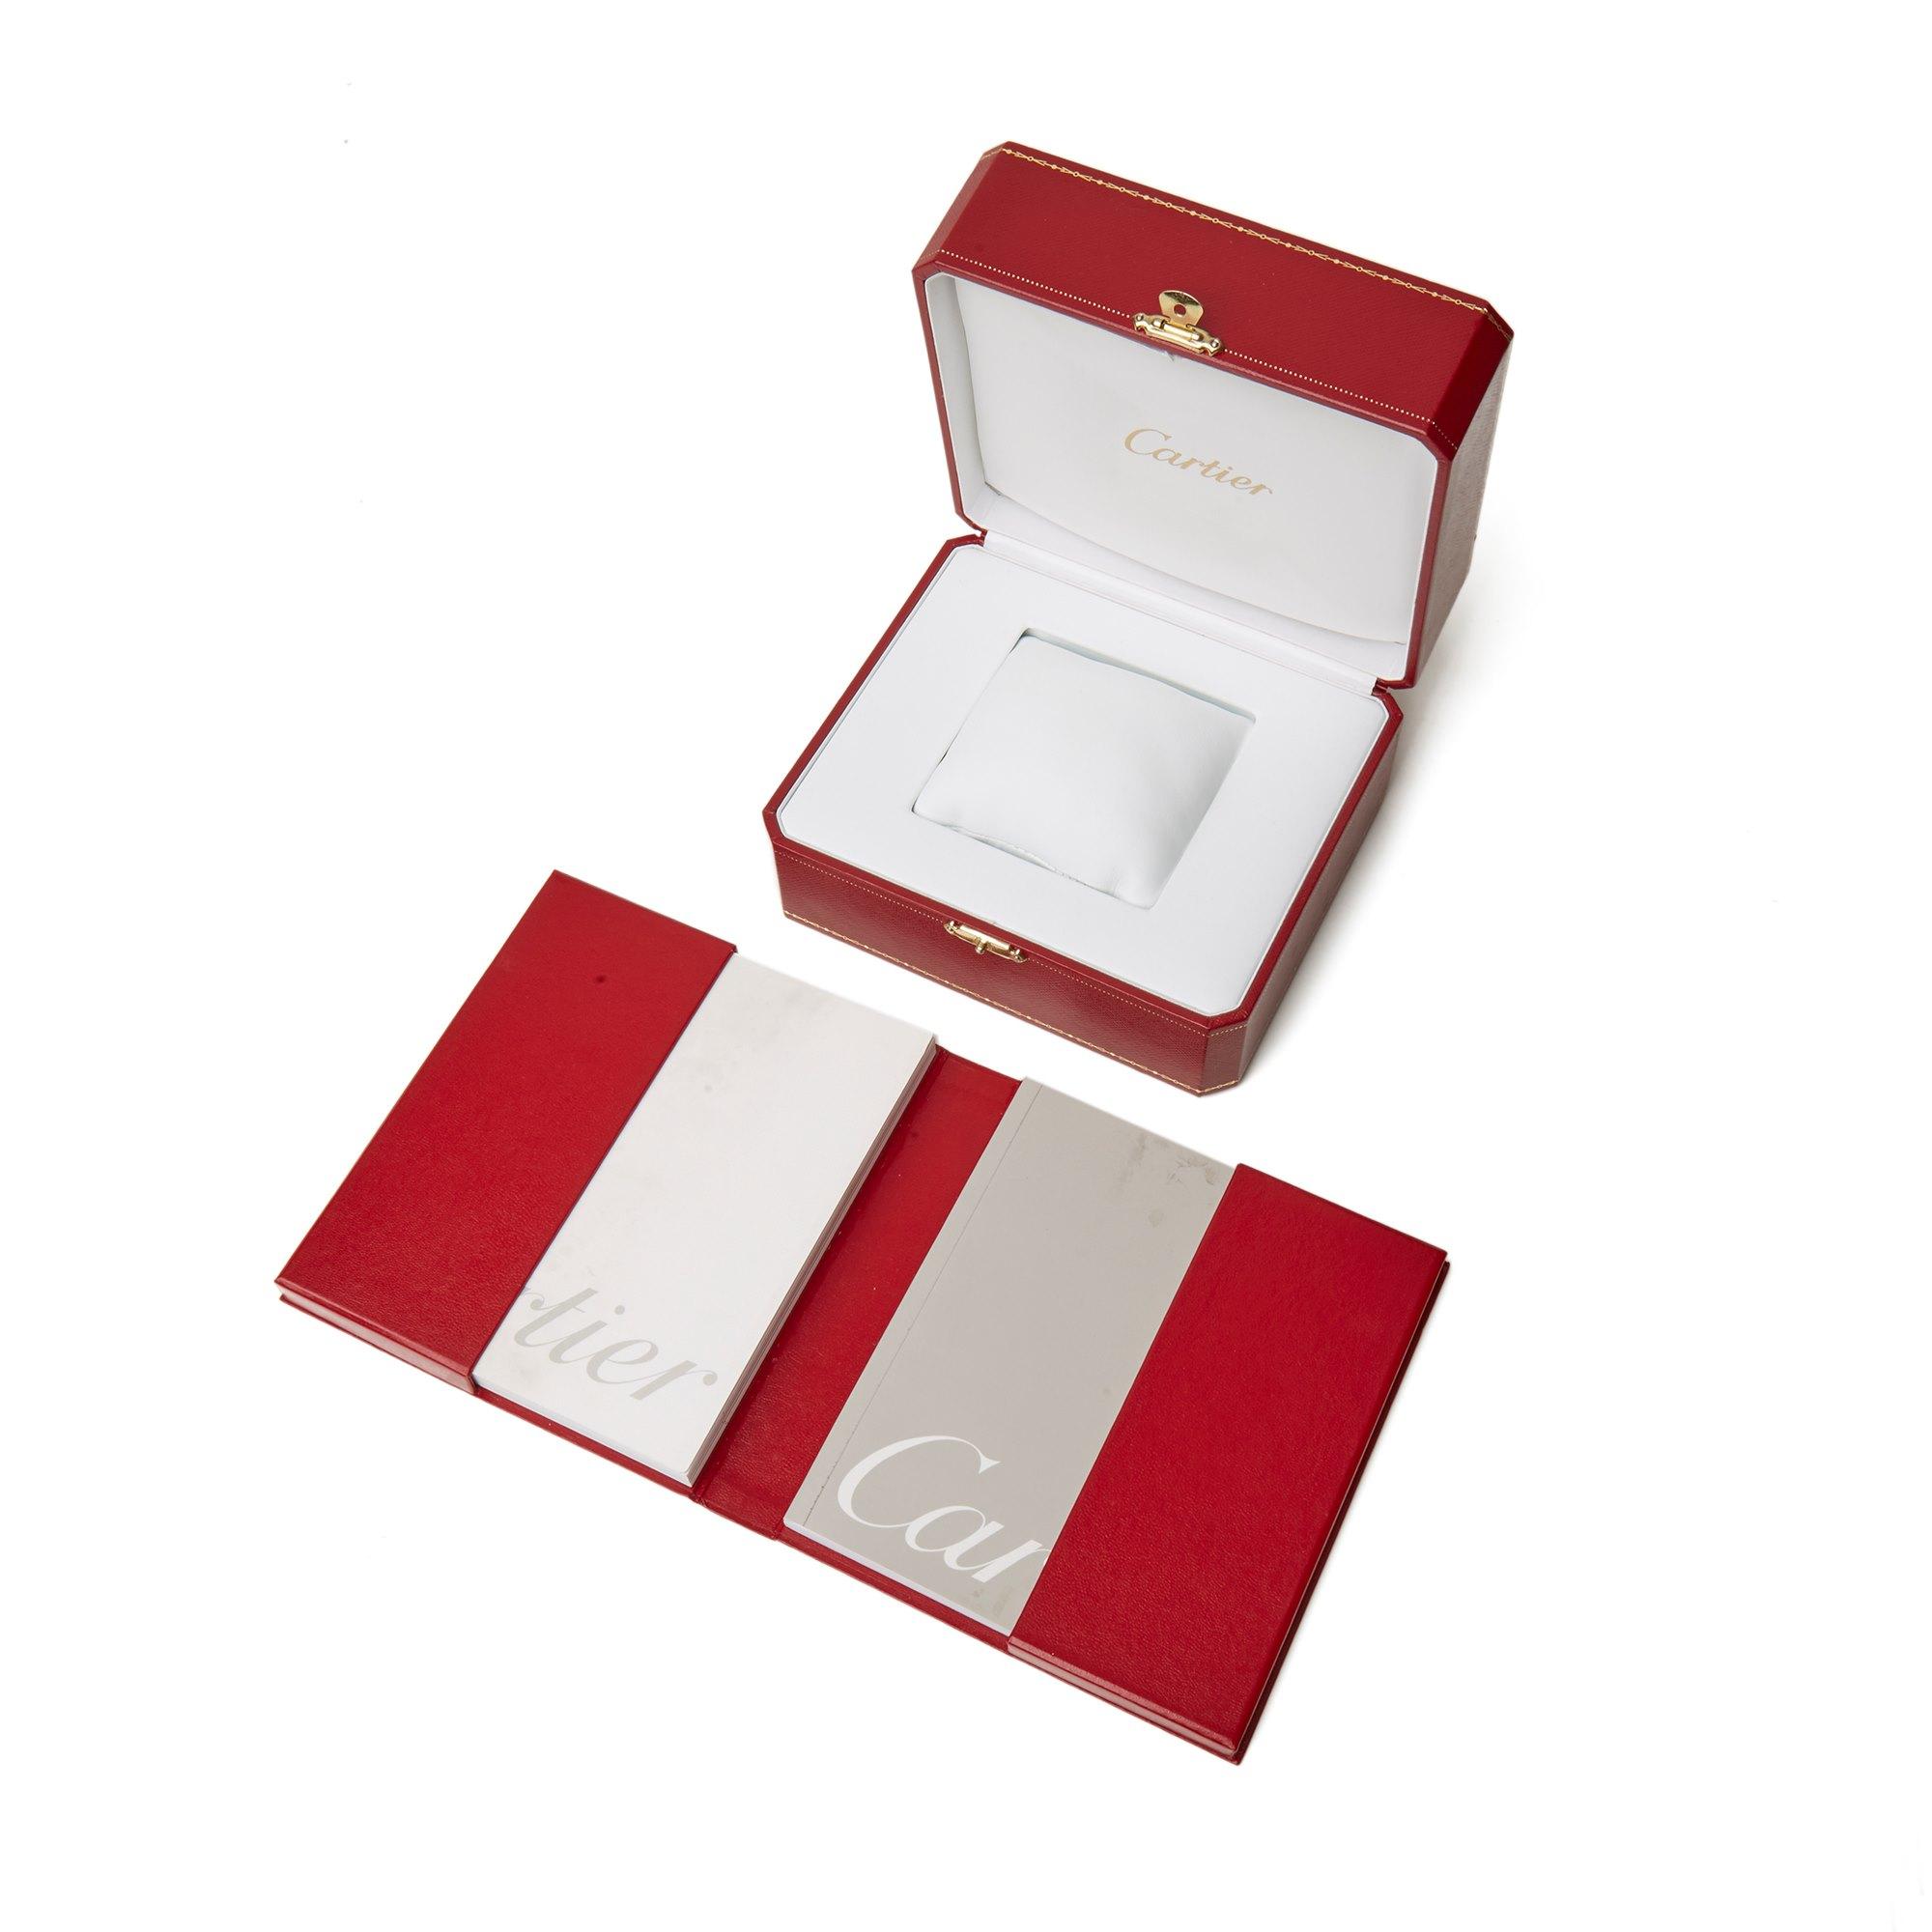 Cartier Pasha Seatimer 18K Yellow Gold W3014456 or 2395